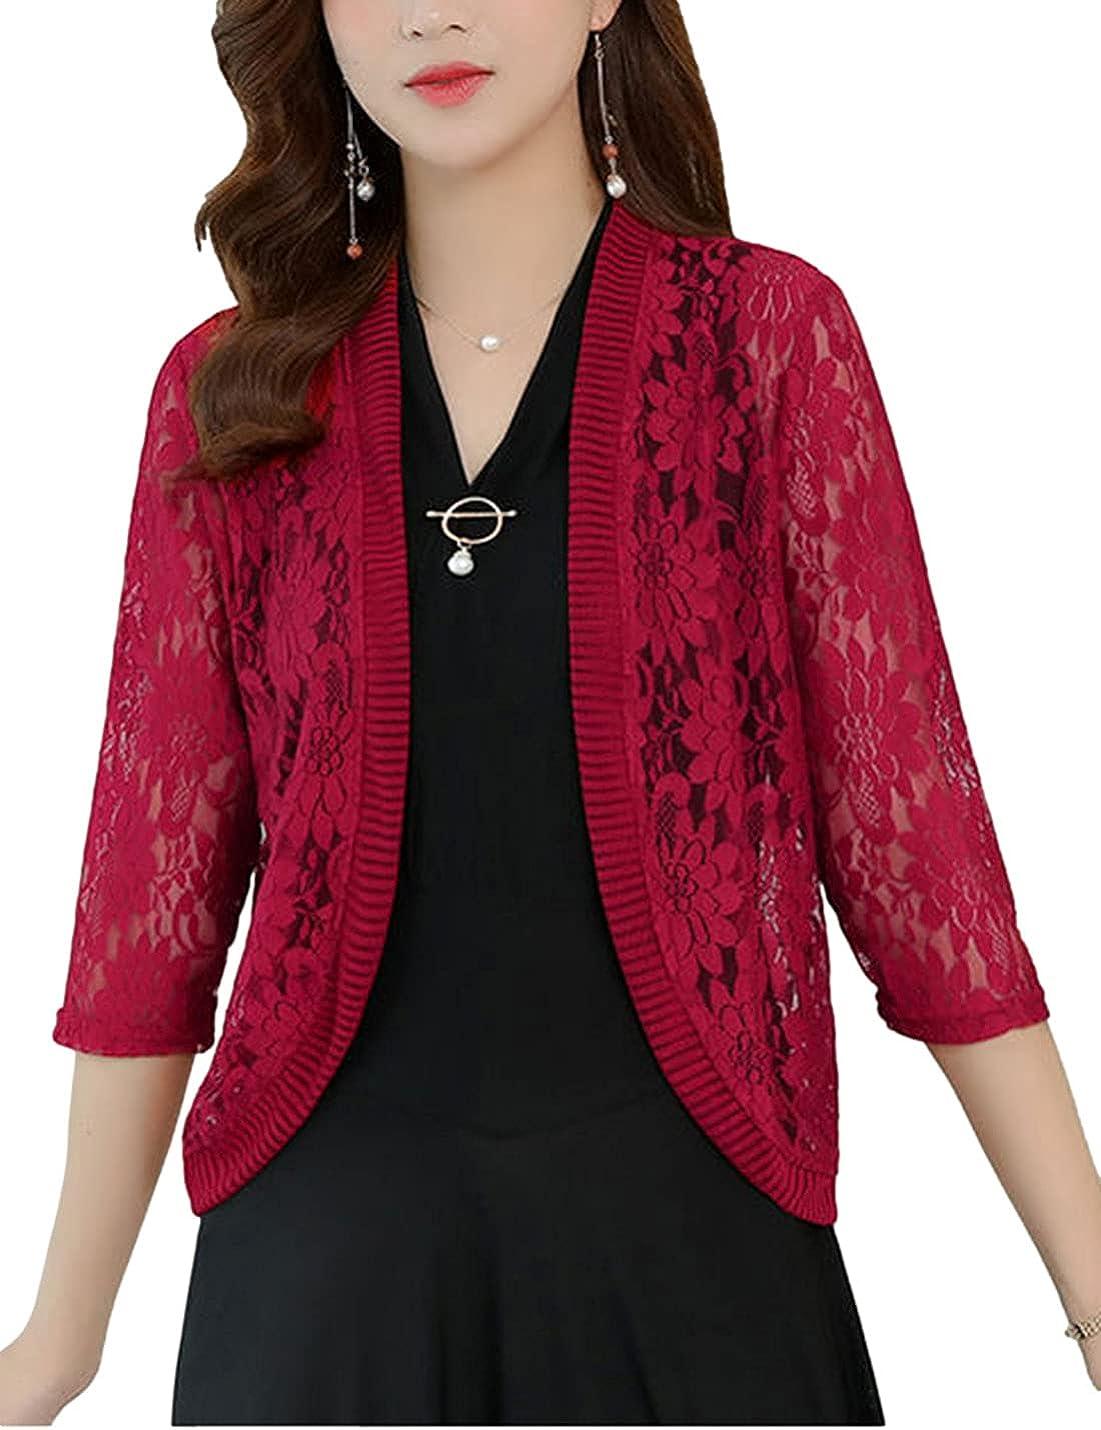 AMEBELLE Women's 3/4 Sleeve Lace Open Front Cardigan Crochet Bolero Shrug Tops